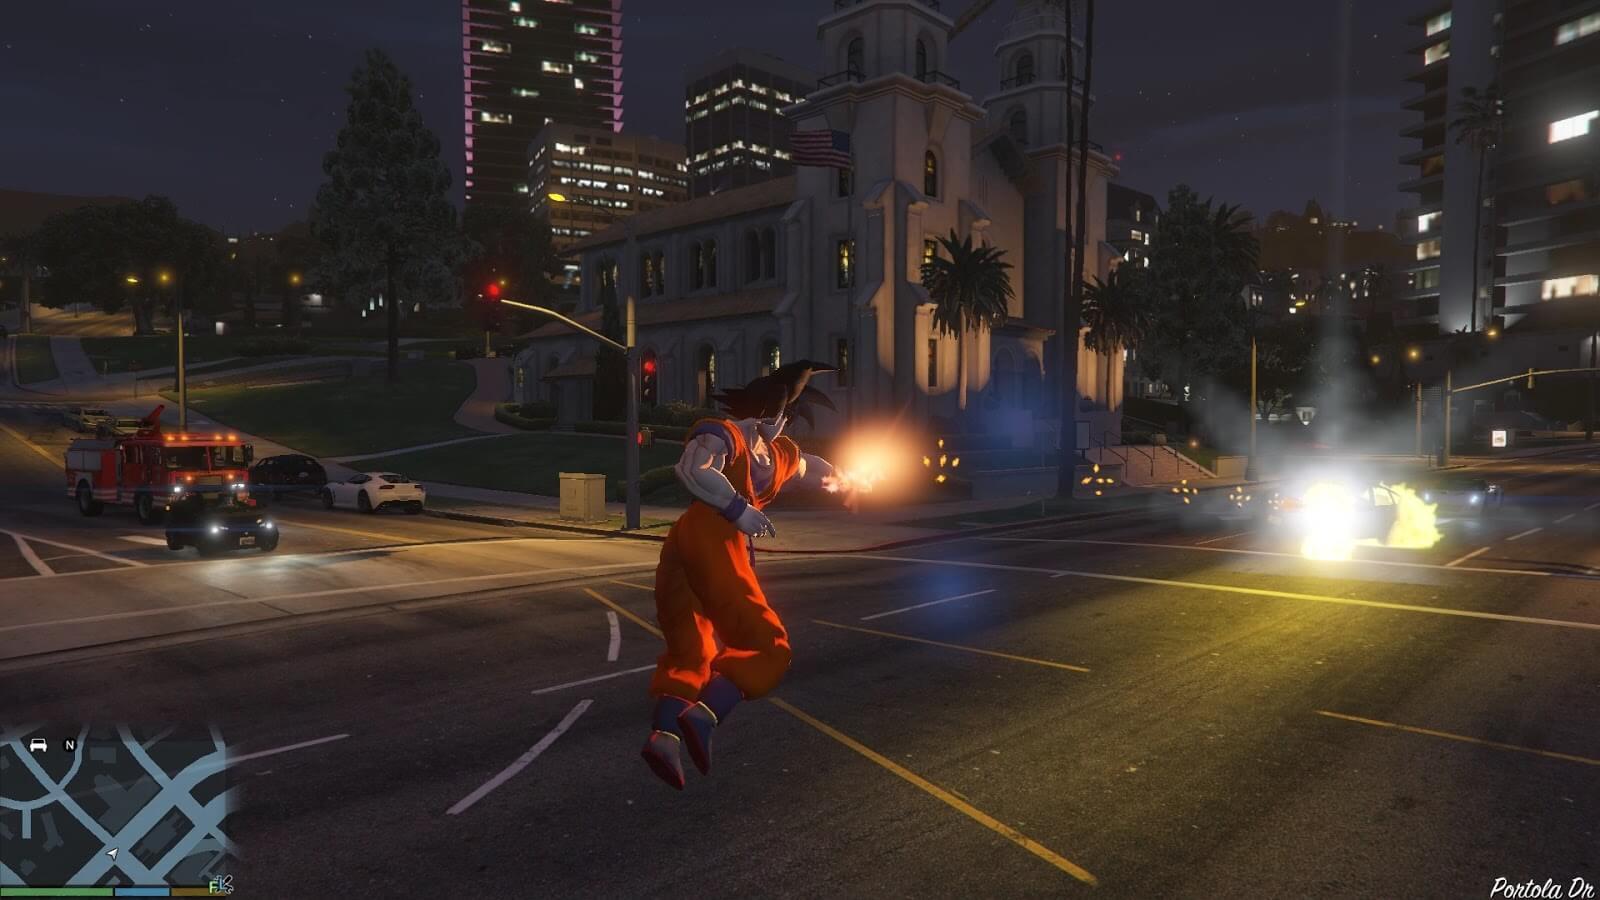 Dragon Ball comes to Grand Theft Auto V thanks to this amazing mod